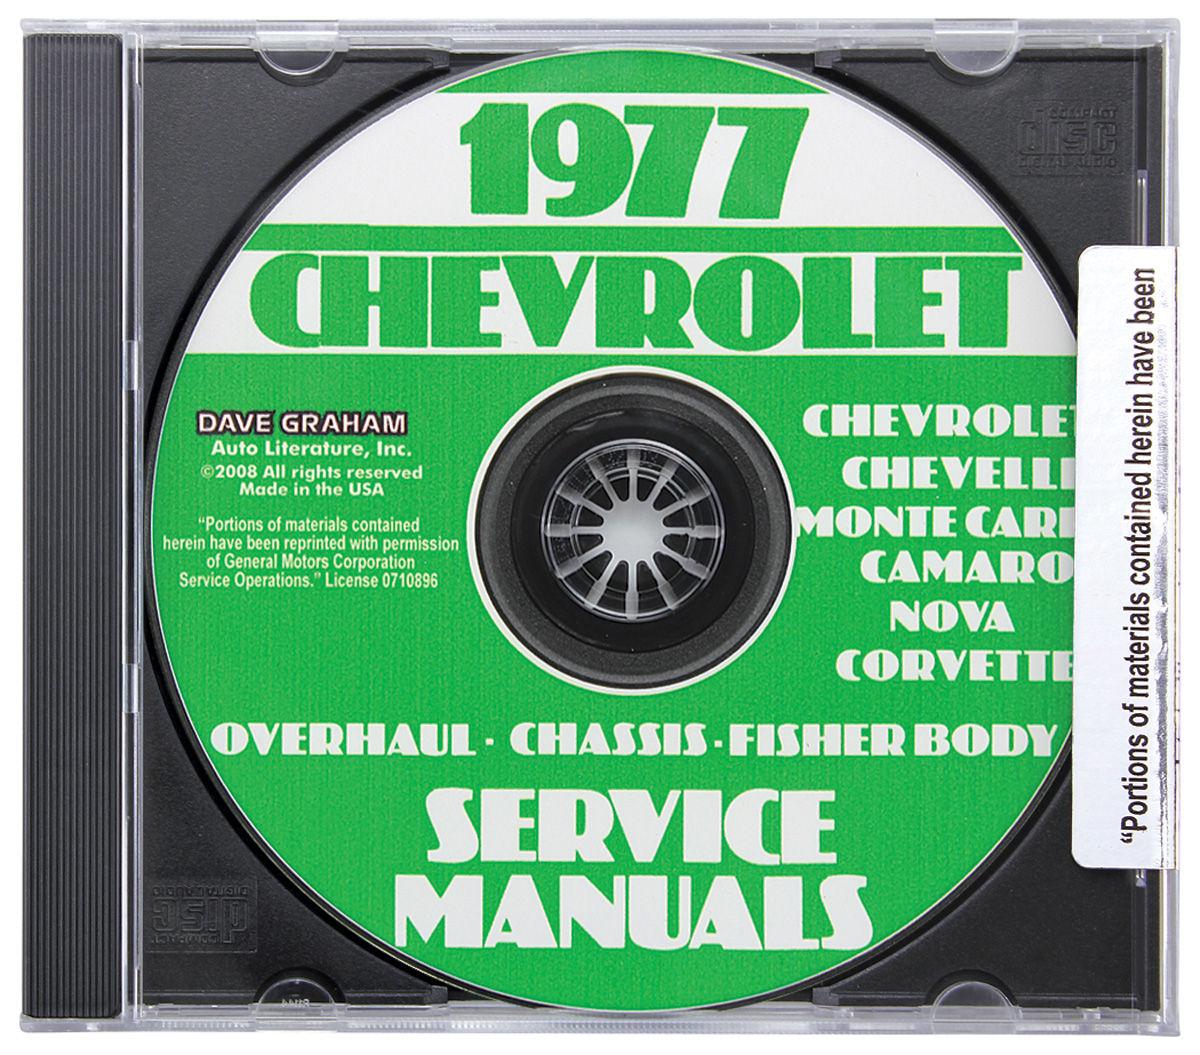 Factory Shop Manuals, CD-ROM, 1977 Monte Carlo